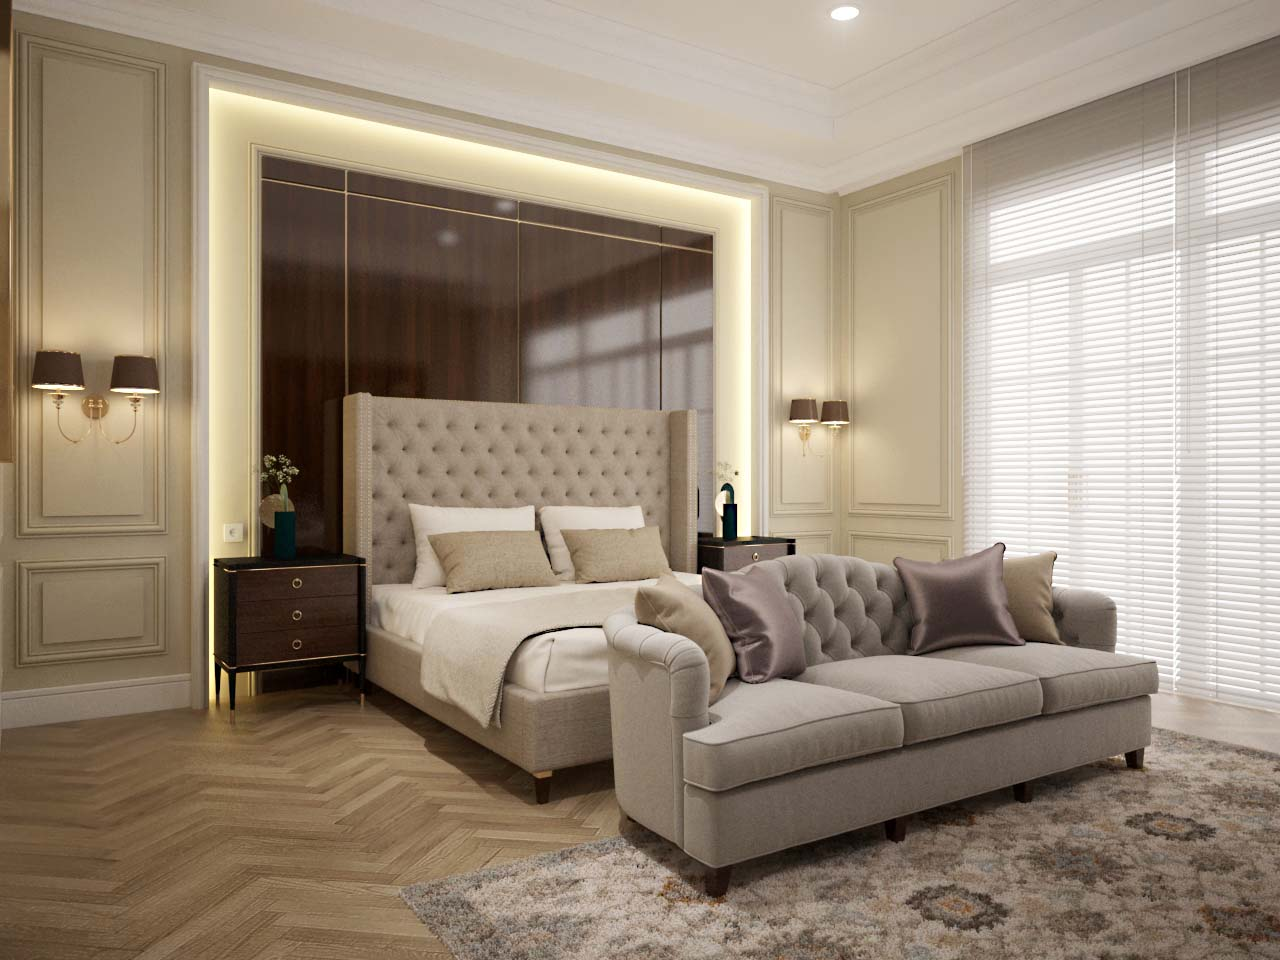 Interior-Puri-Wargasatwa-Lt.2-Master-Bedroom-A.jpg